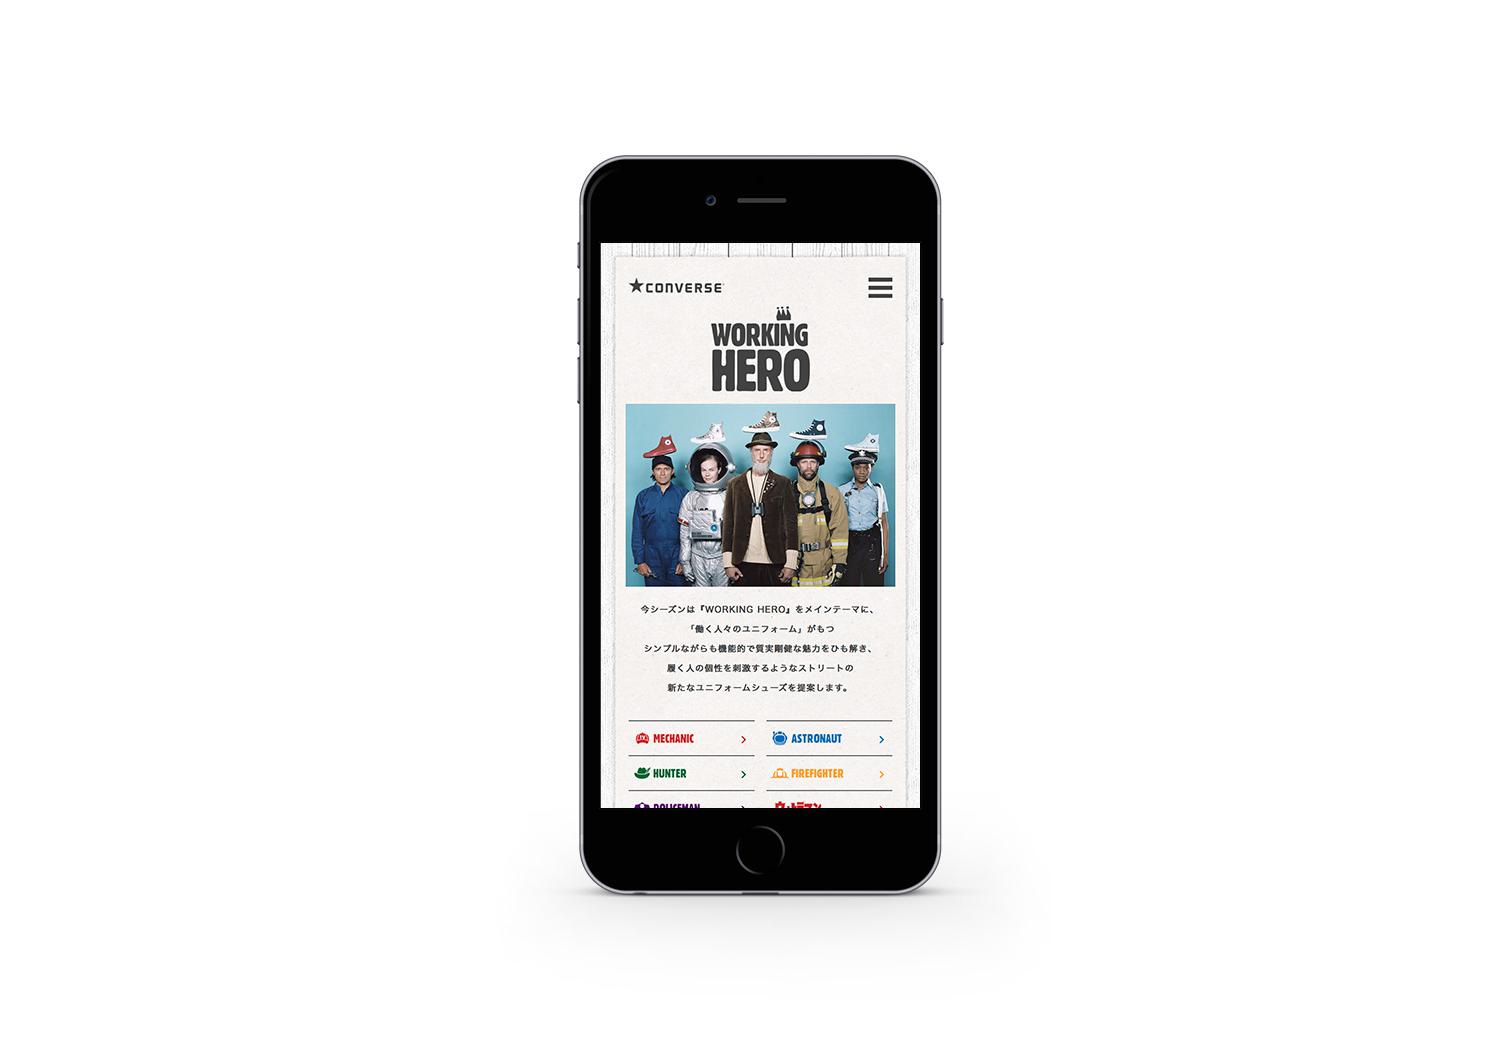 CONVERSE WORKING HERO Smartphone site 2016